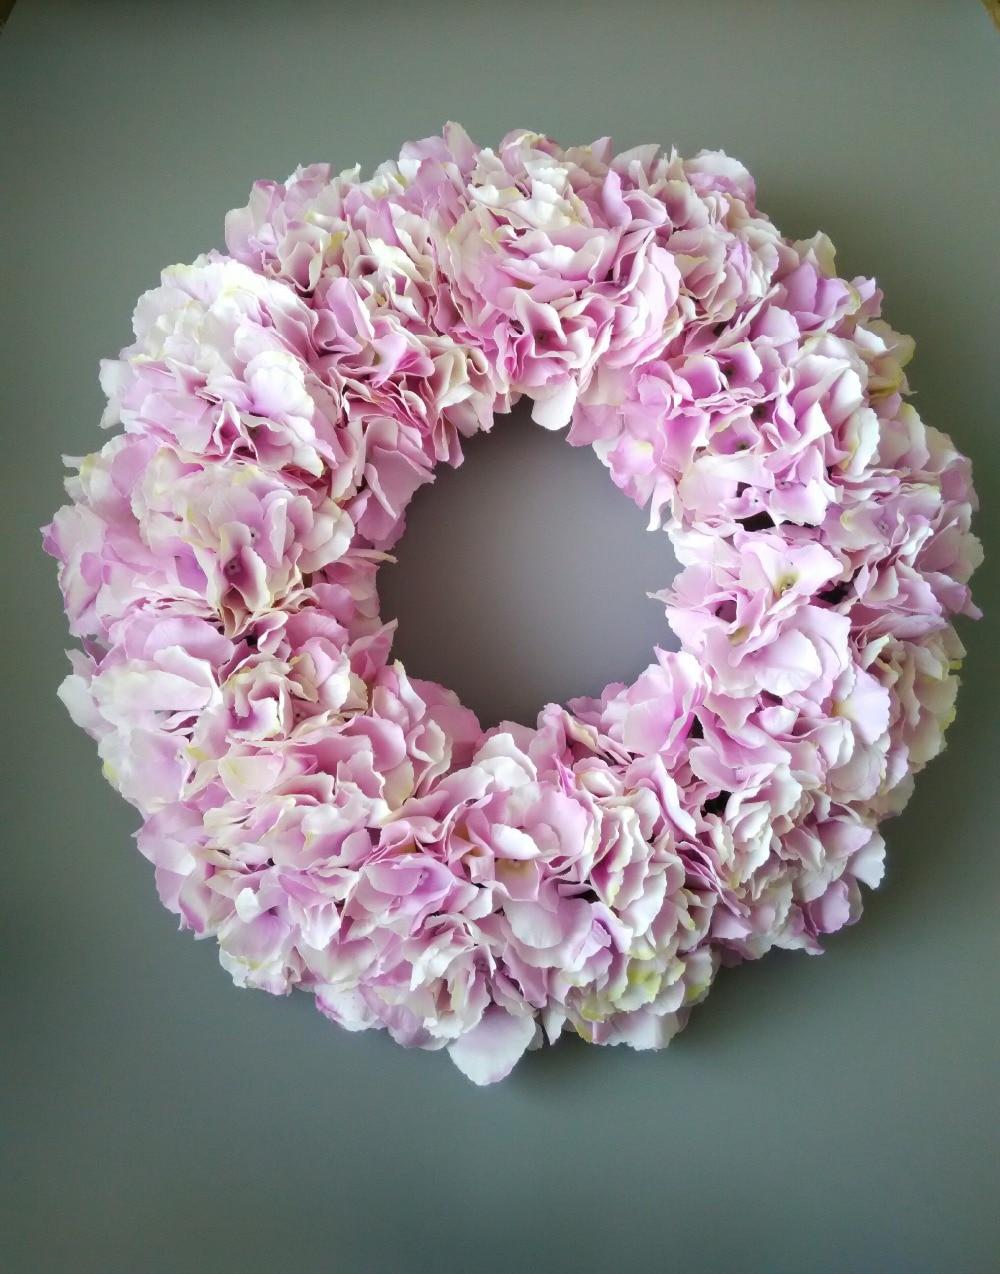 Wedding Decoration Dream Pink Wreaths Front Door Hydrangea Garland 16  Inches Party Birthday Table Centerpieces Flowers In Wreaths U0026 Garlands From  Home ...